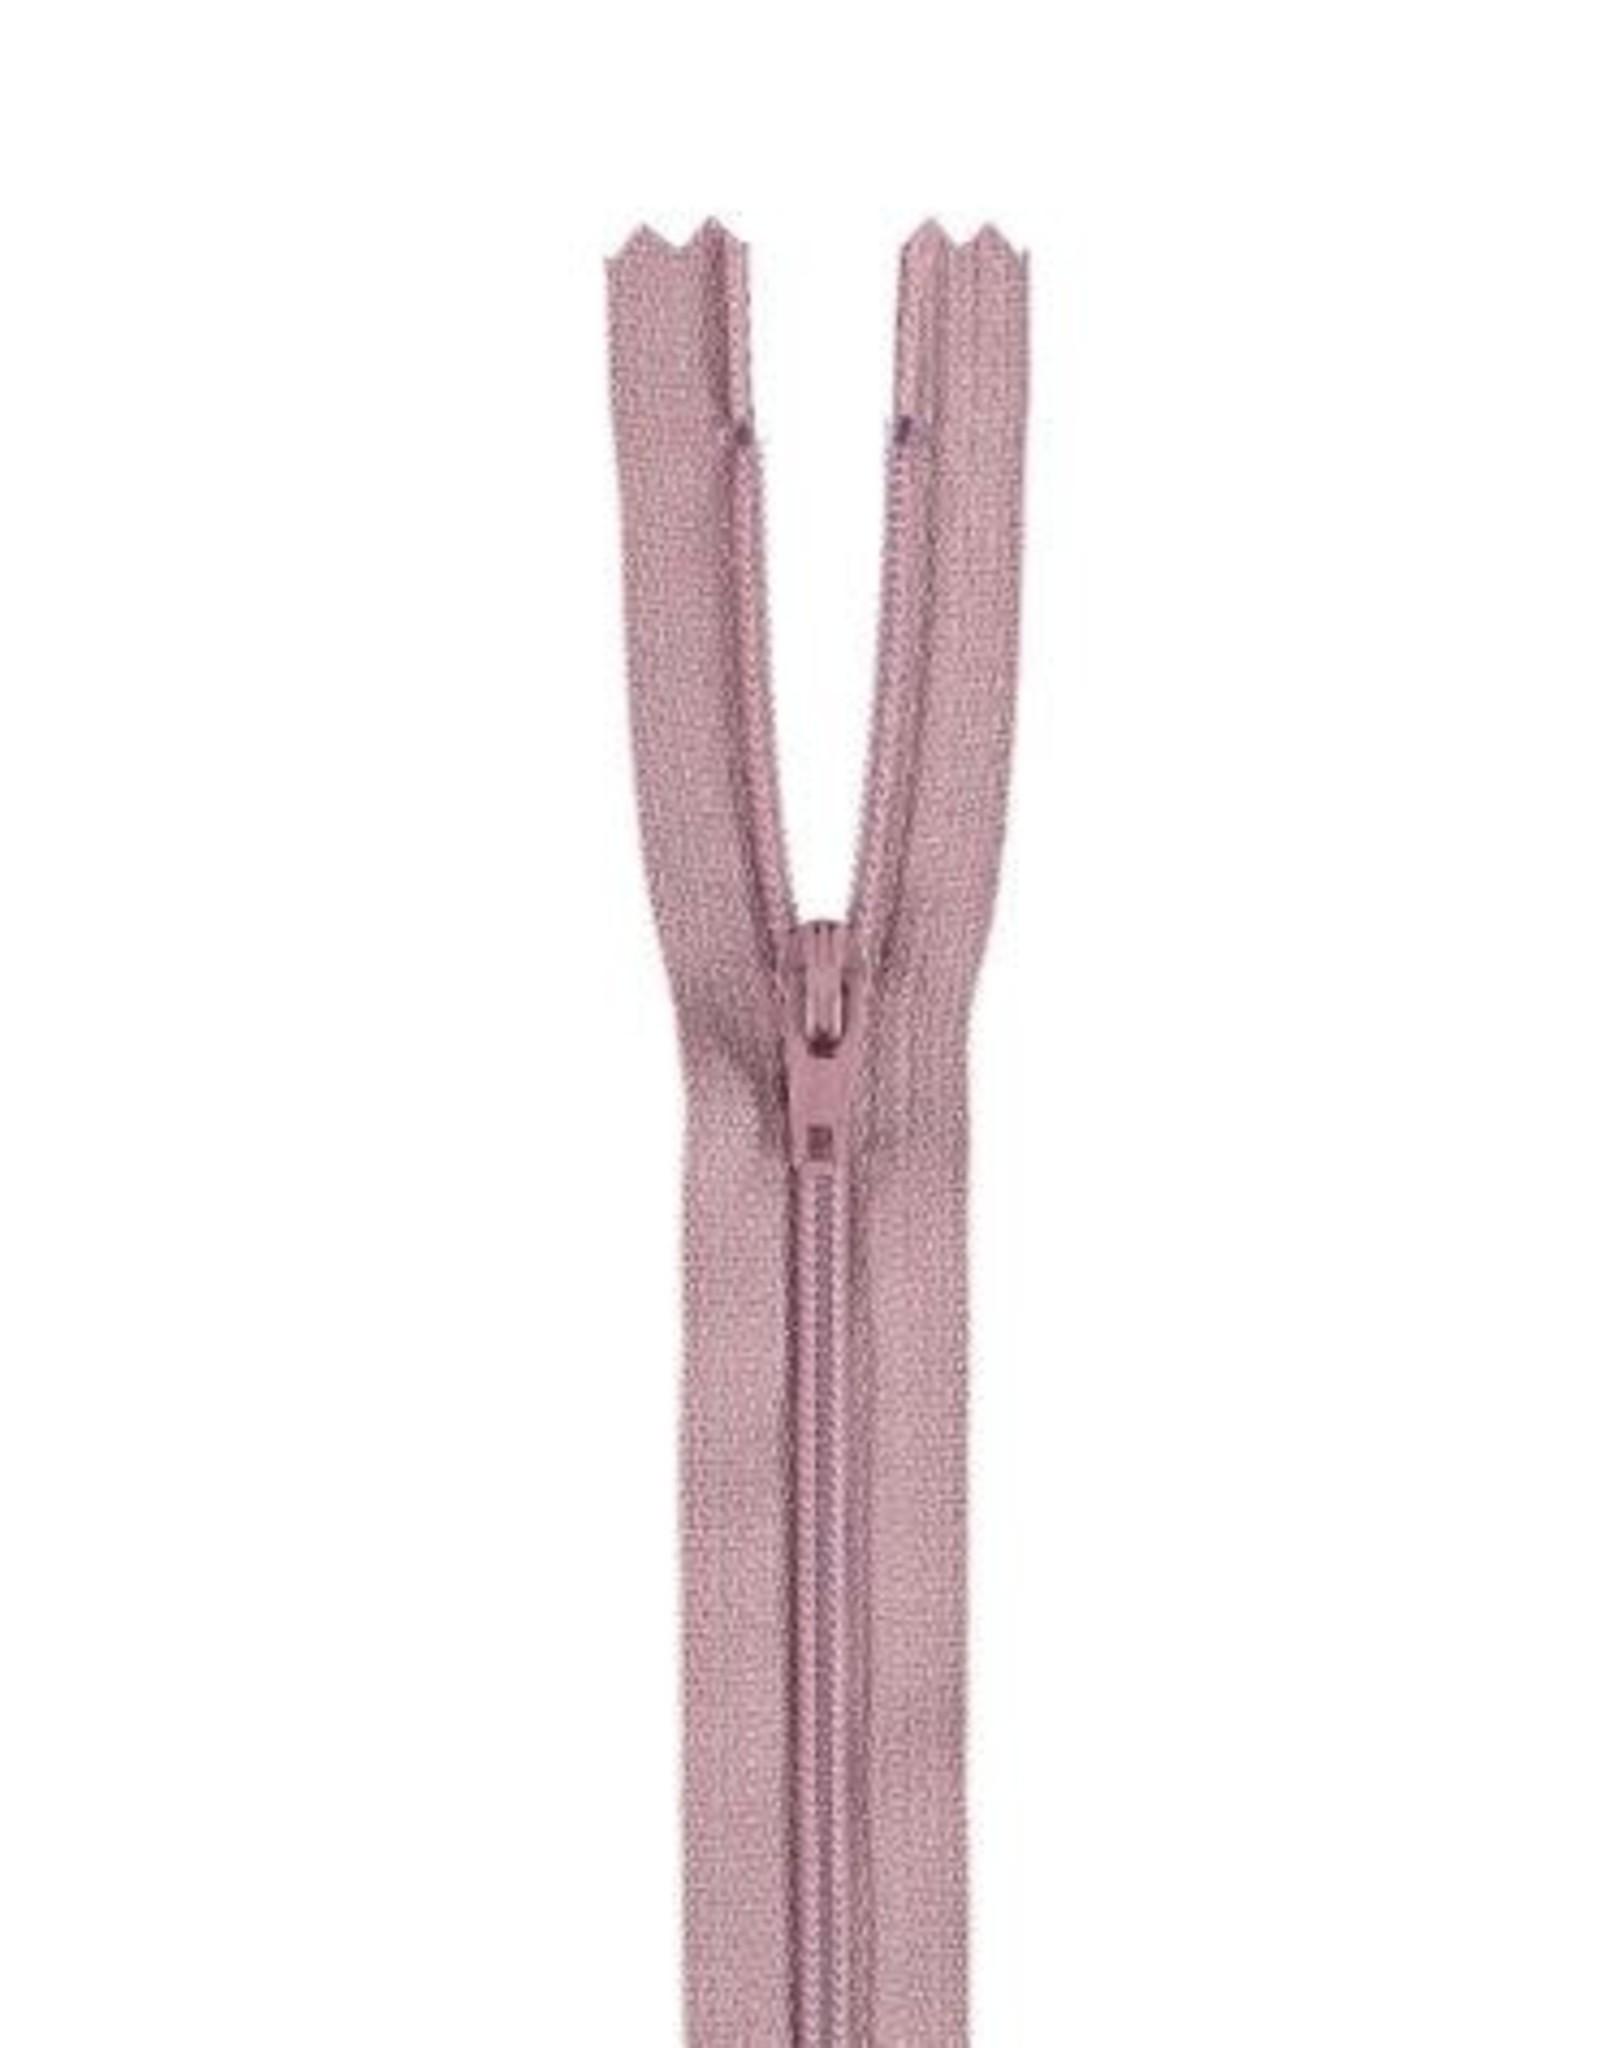 YKK Spiraalrits niet-DB 3mm oud roze 069-15cm